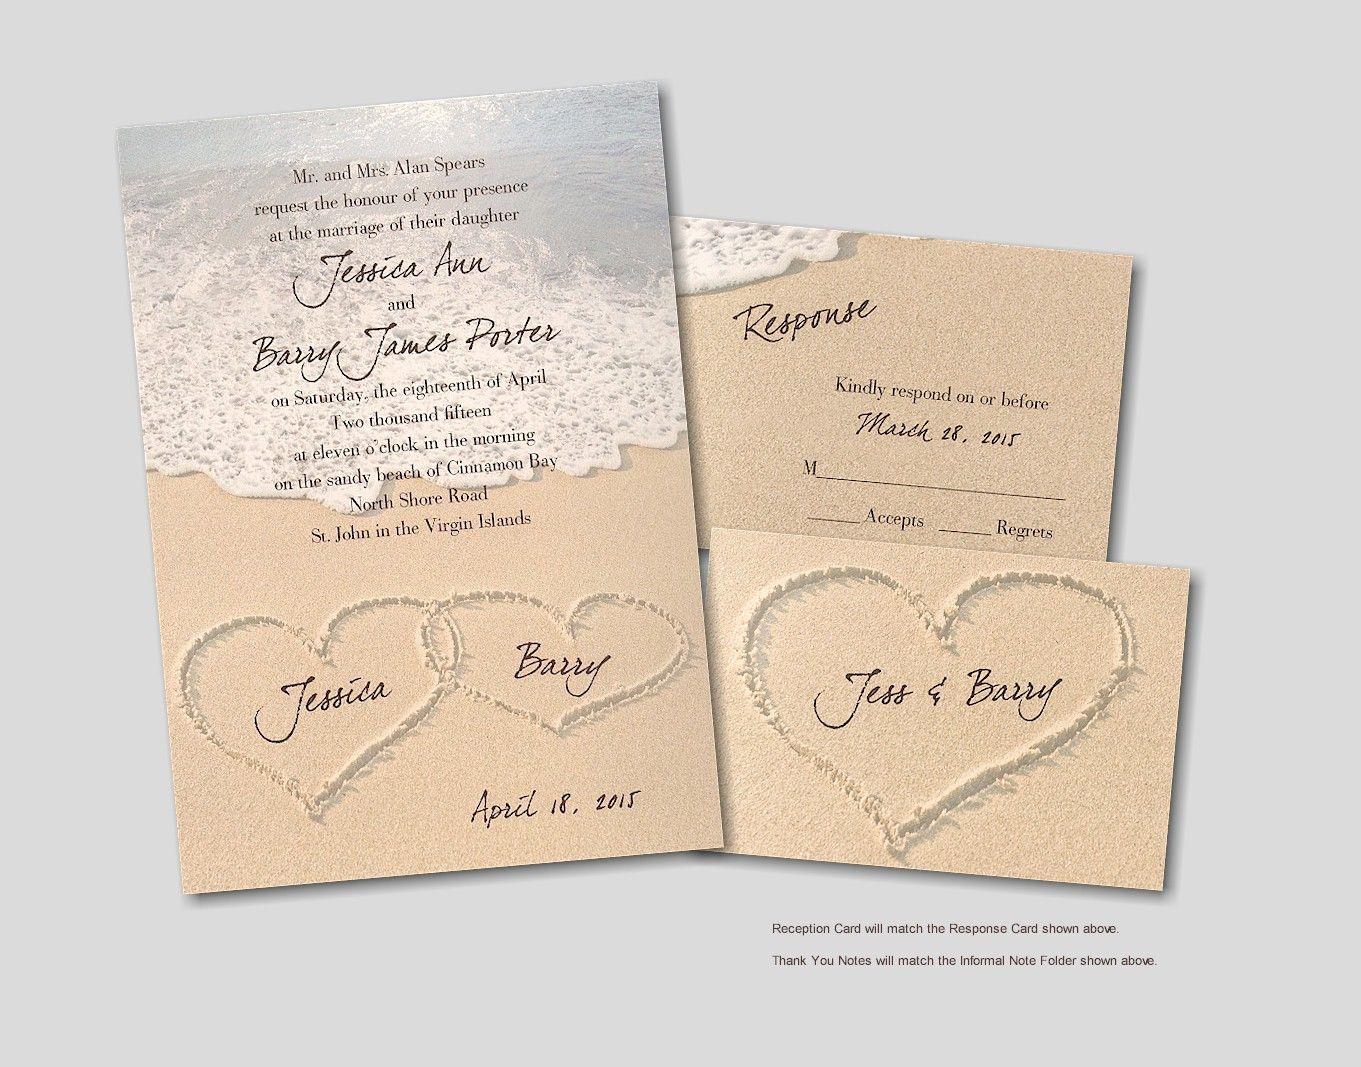 luau wedding invitation templates%0A Beach wedding invitations